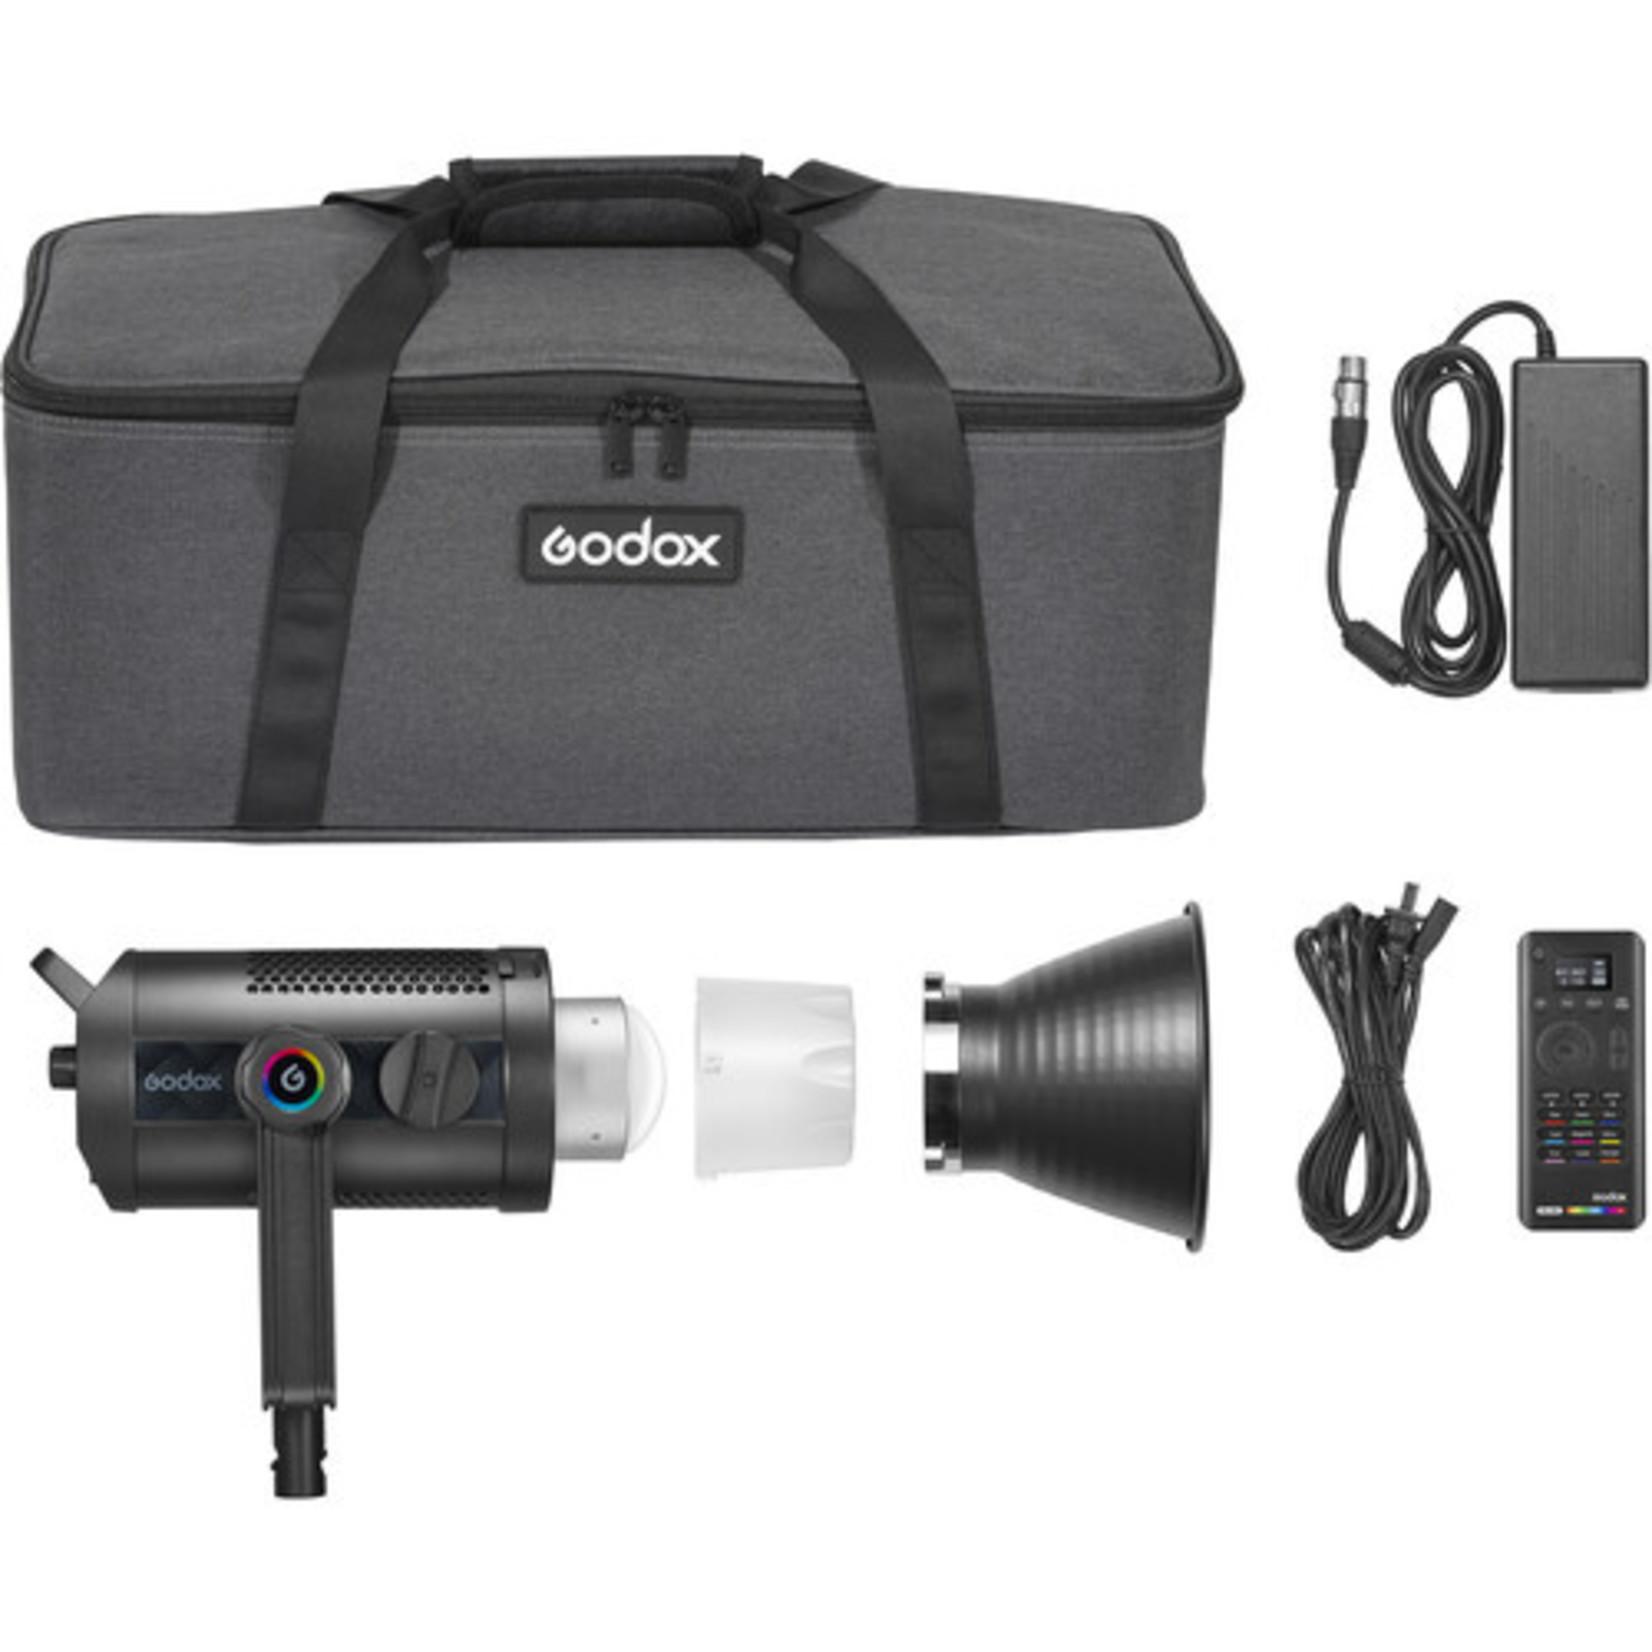 Godox Godox Zoom RGB LED Video Light